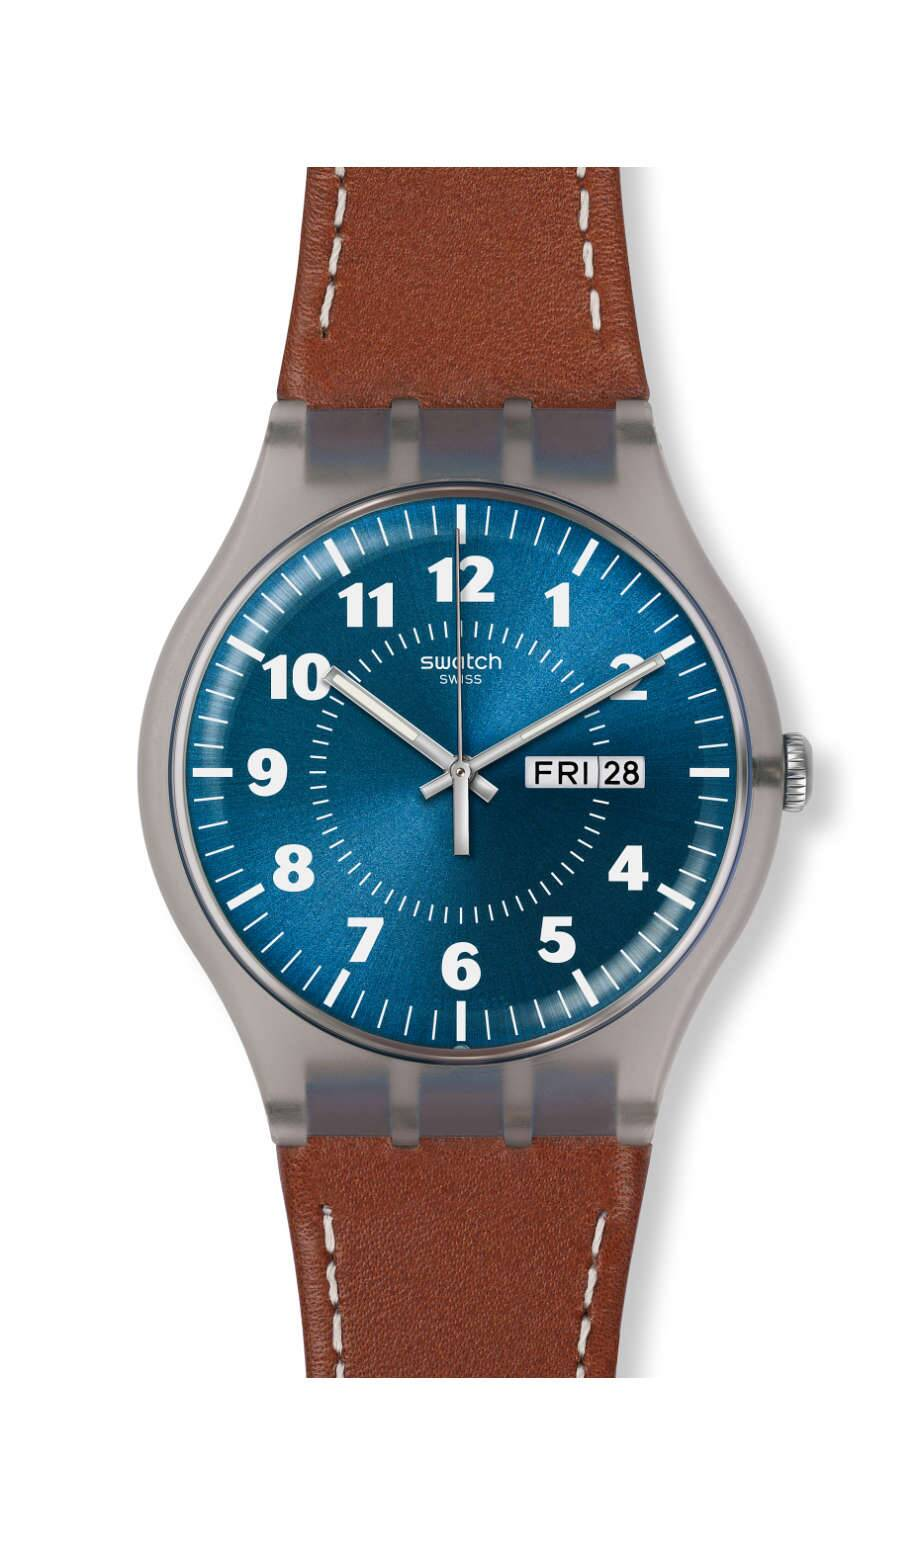 Swatch - VENT BRULANT - 1